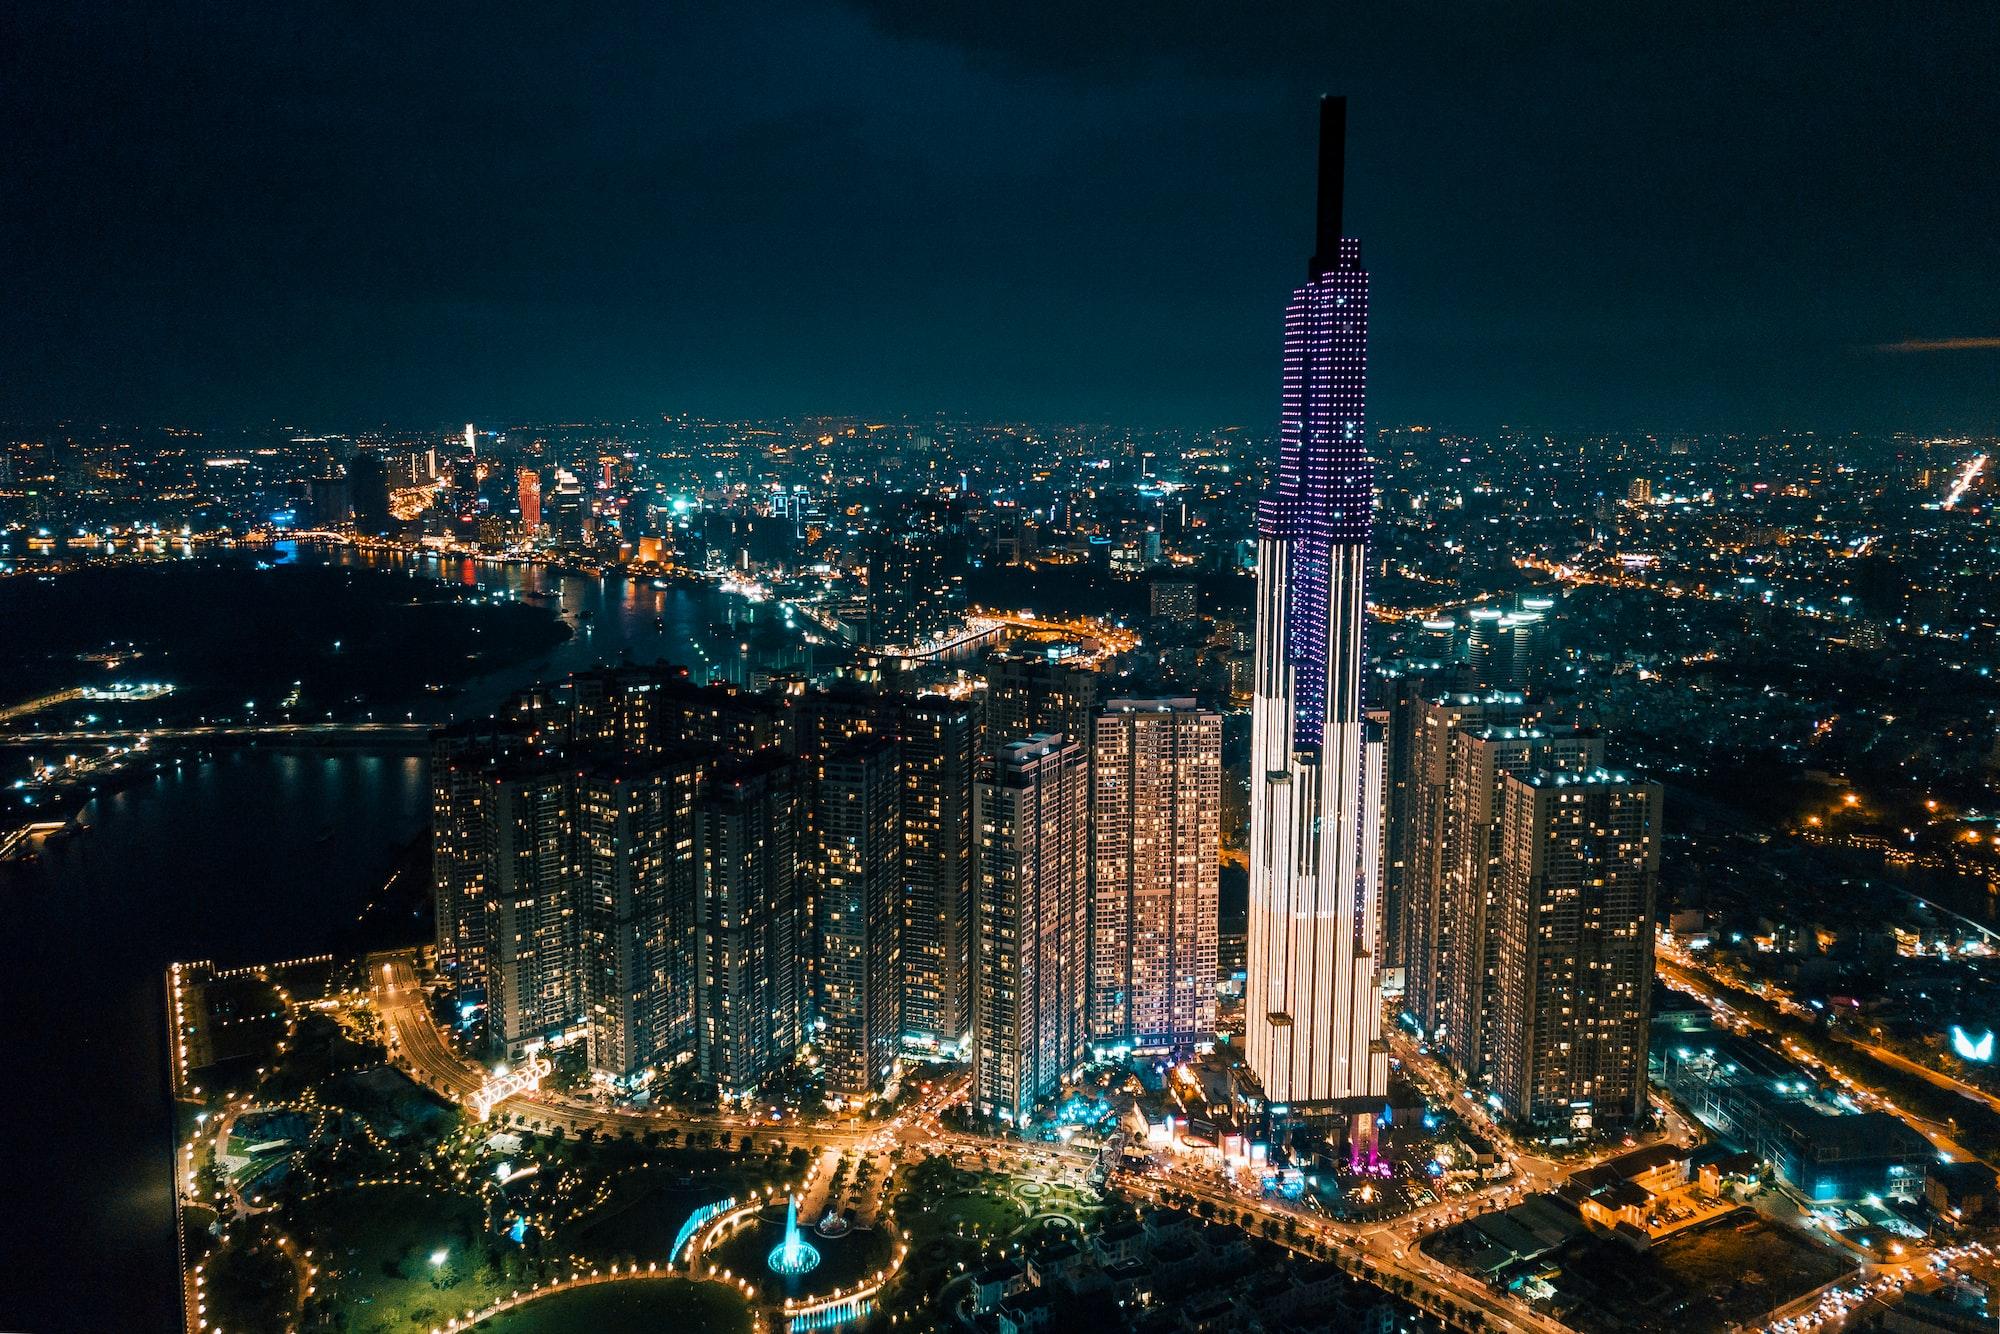 Landmark 81 by night